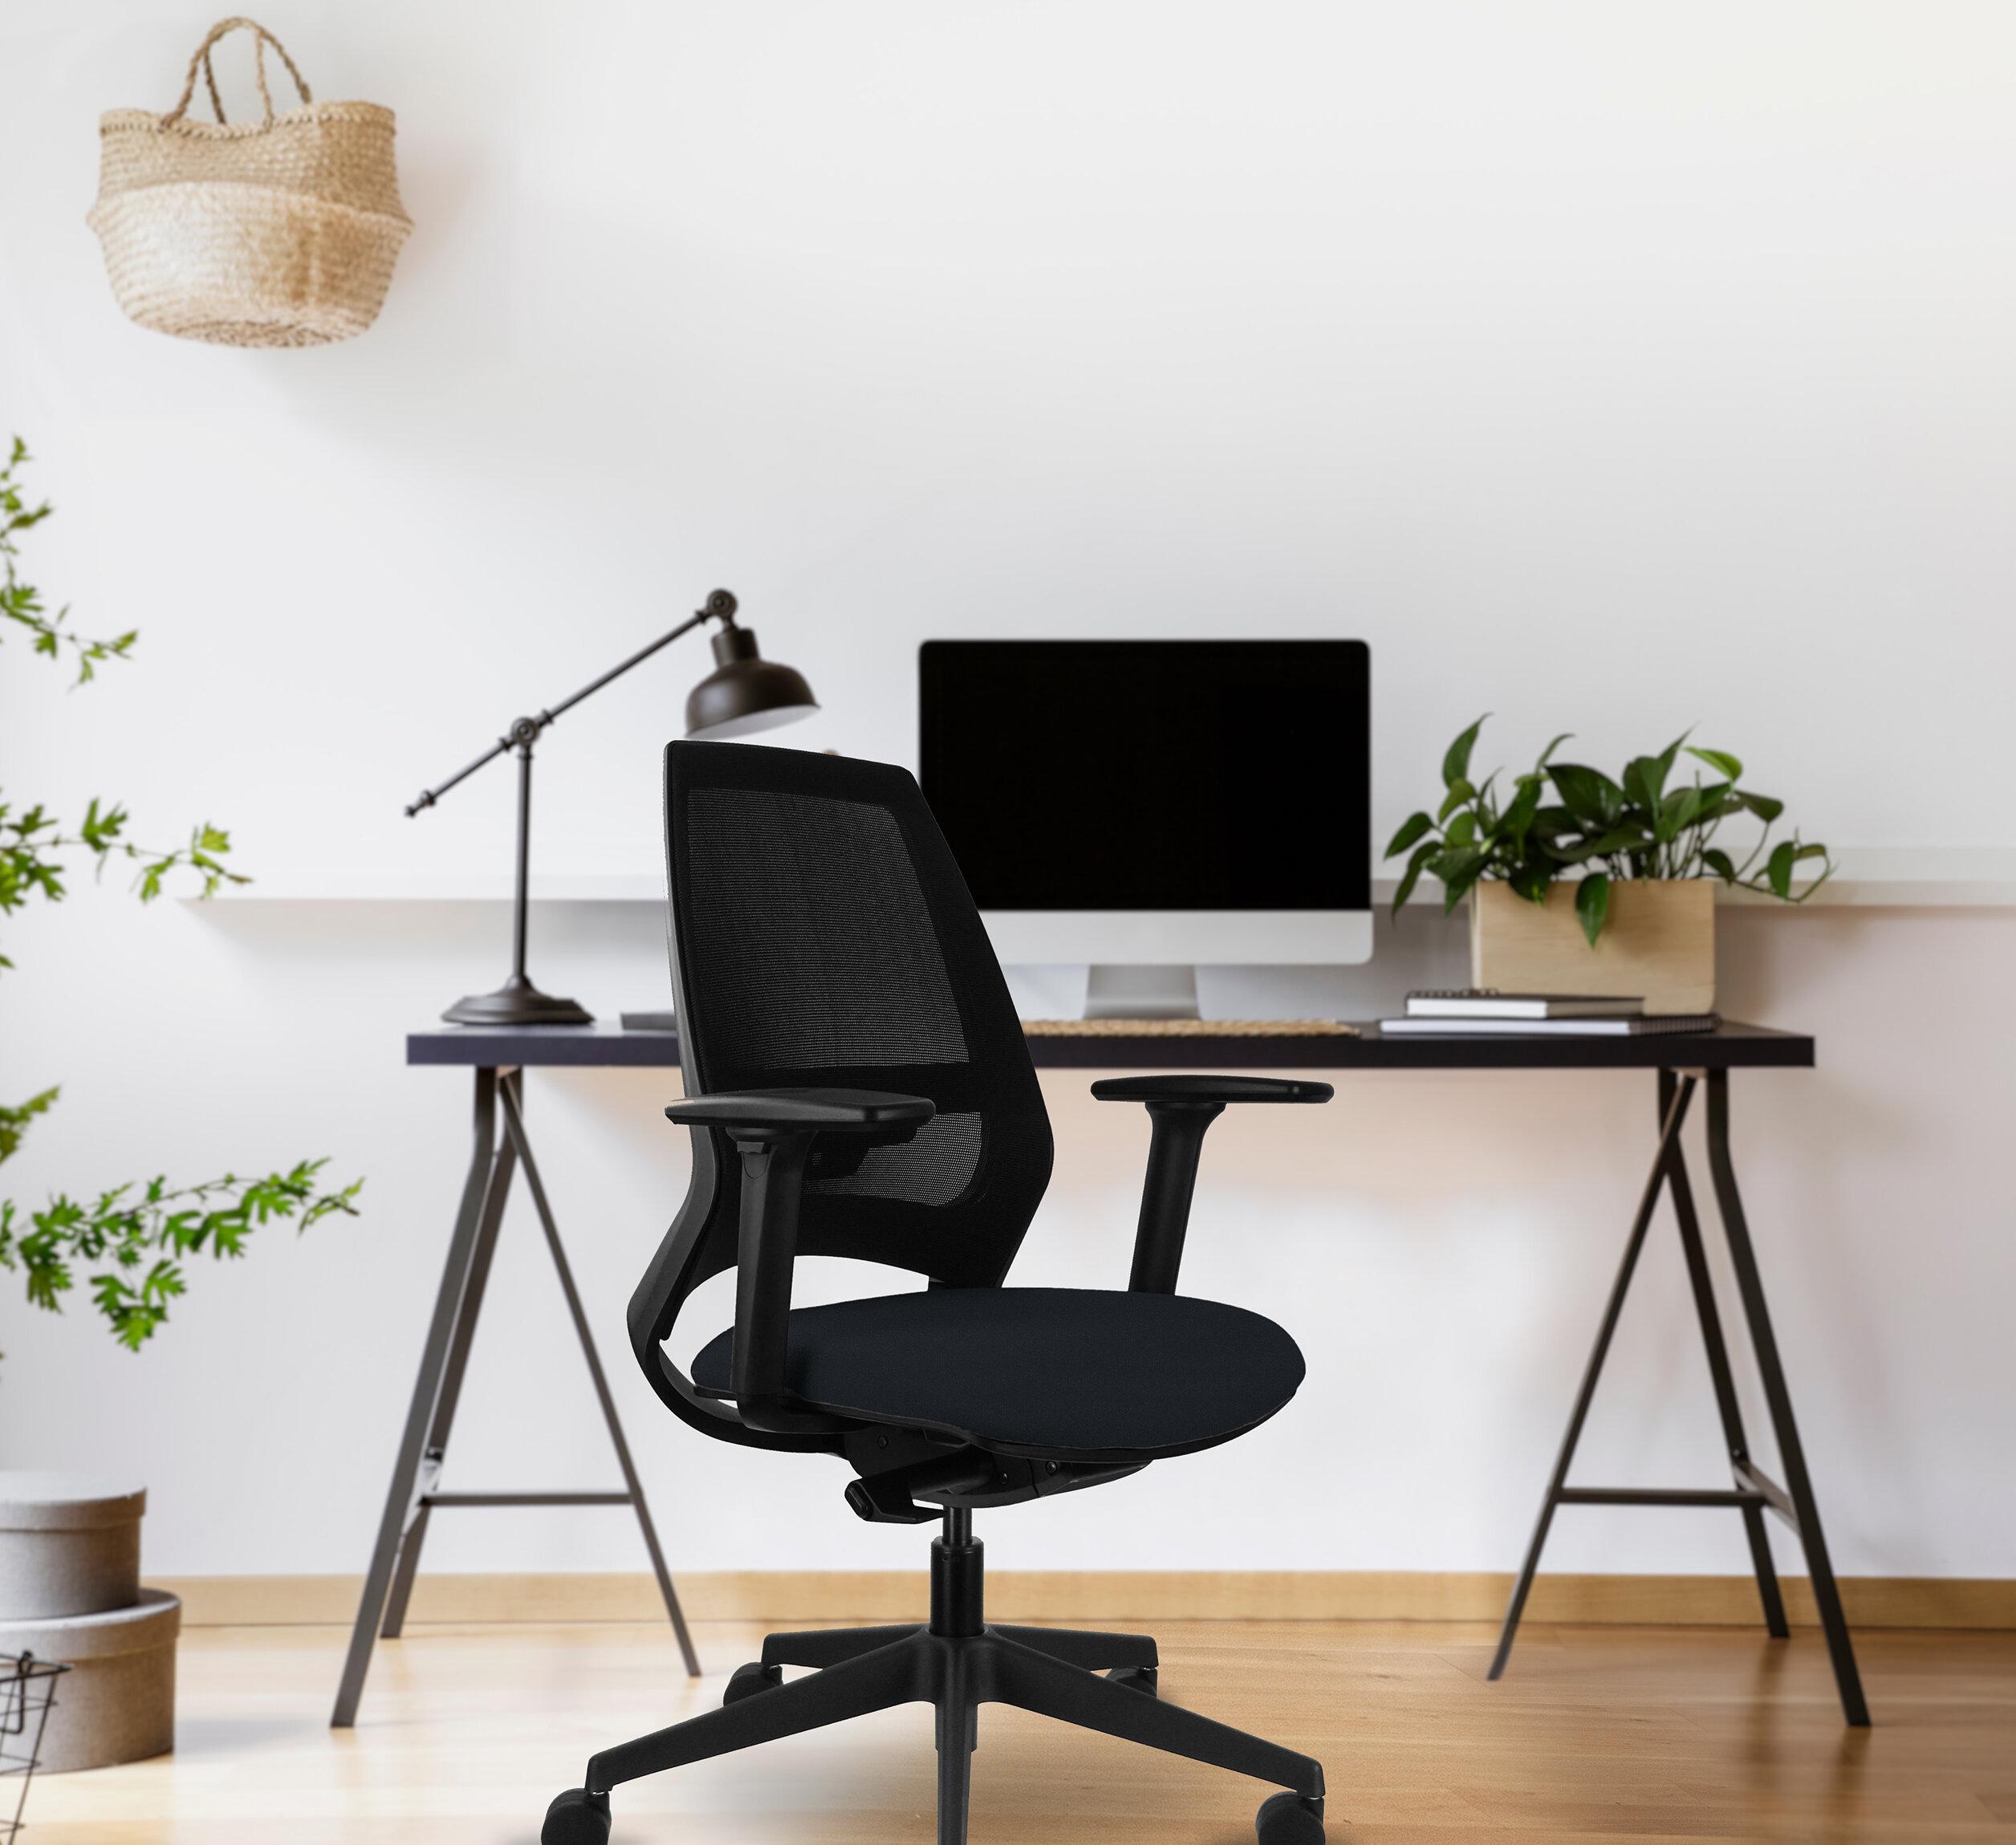 Ebern Designs Bonny Mesh Desk Chair Reviews Wayfair Co Uk